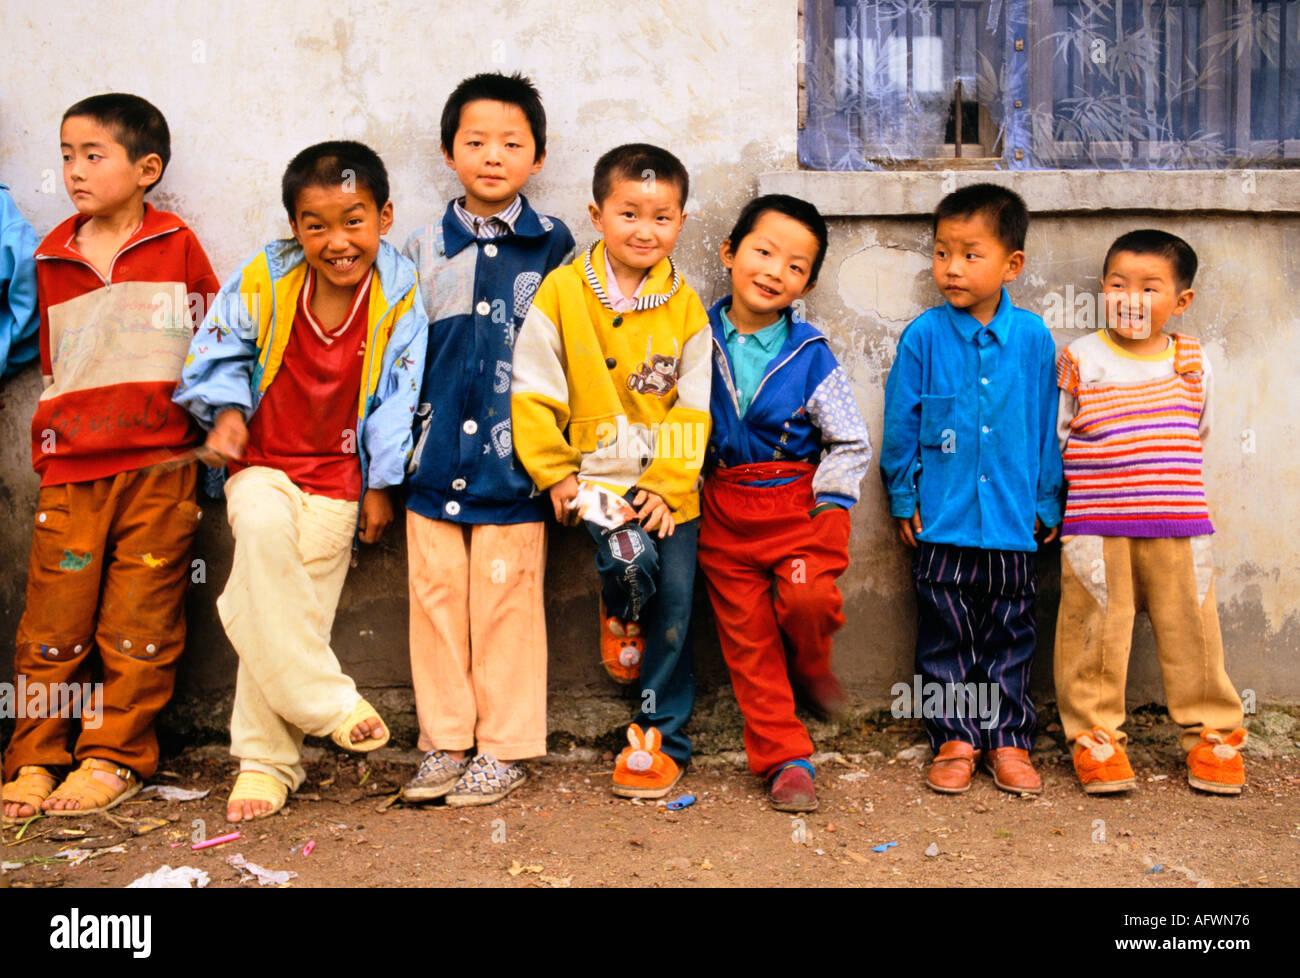 China All Boys Liufu Village Anhui Province Abnormally High Ratio  # Bois En Chaene